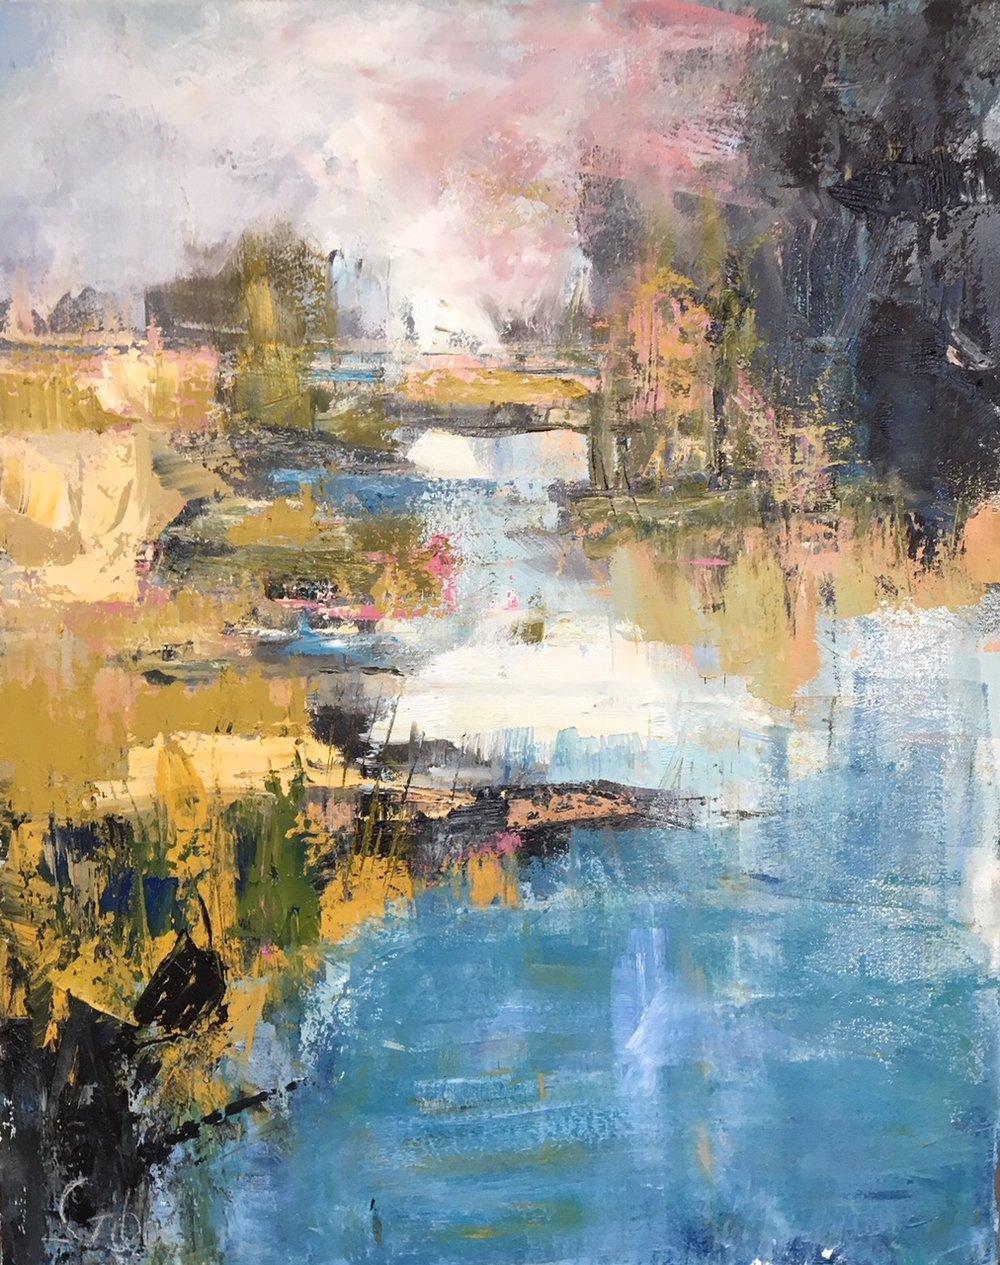 """Quiet"", Oil on Canvas, 30 x 20"